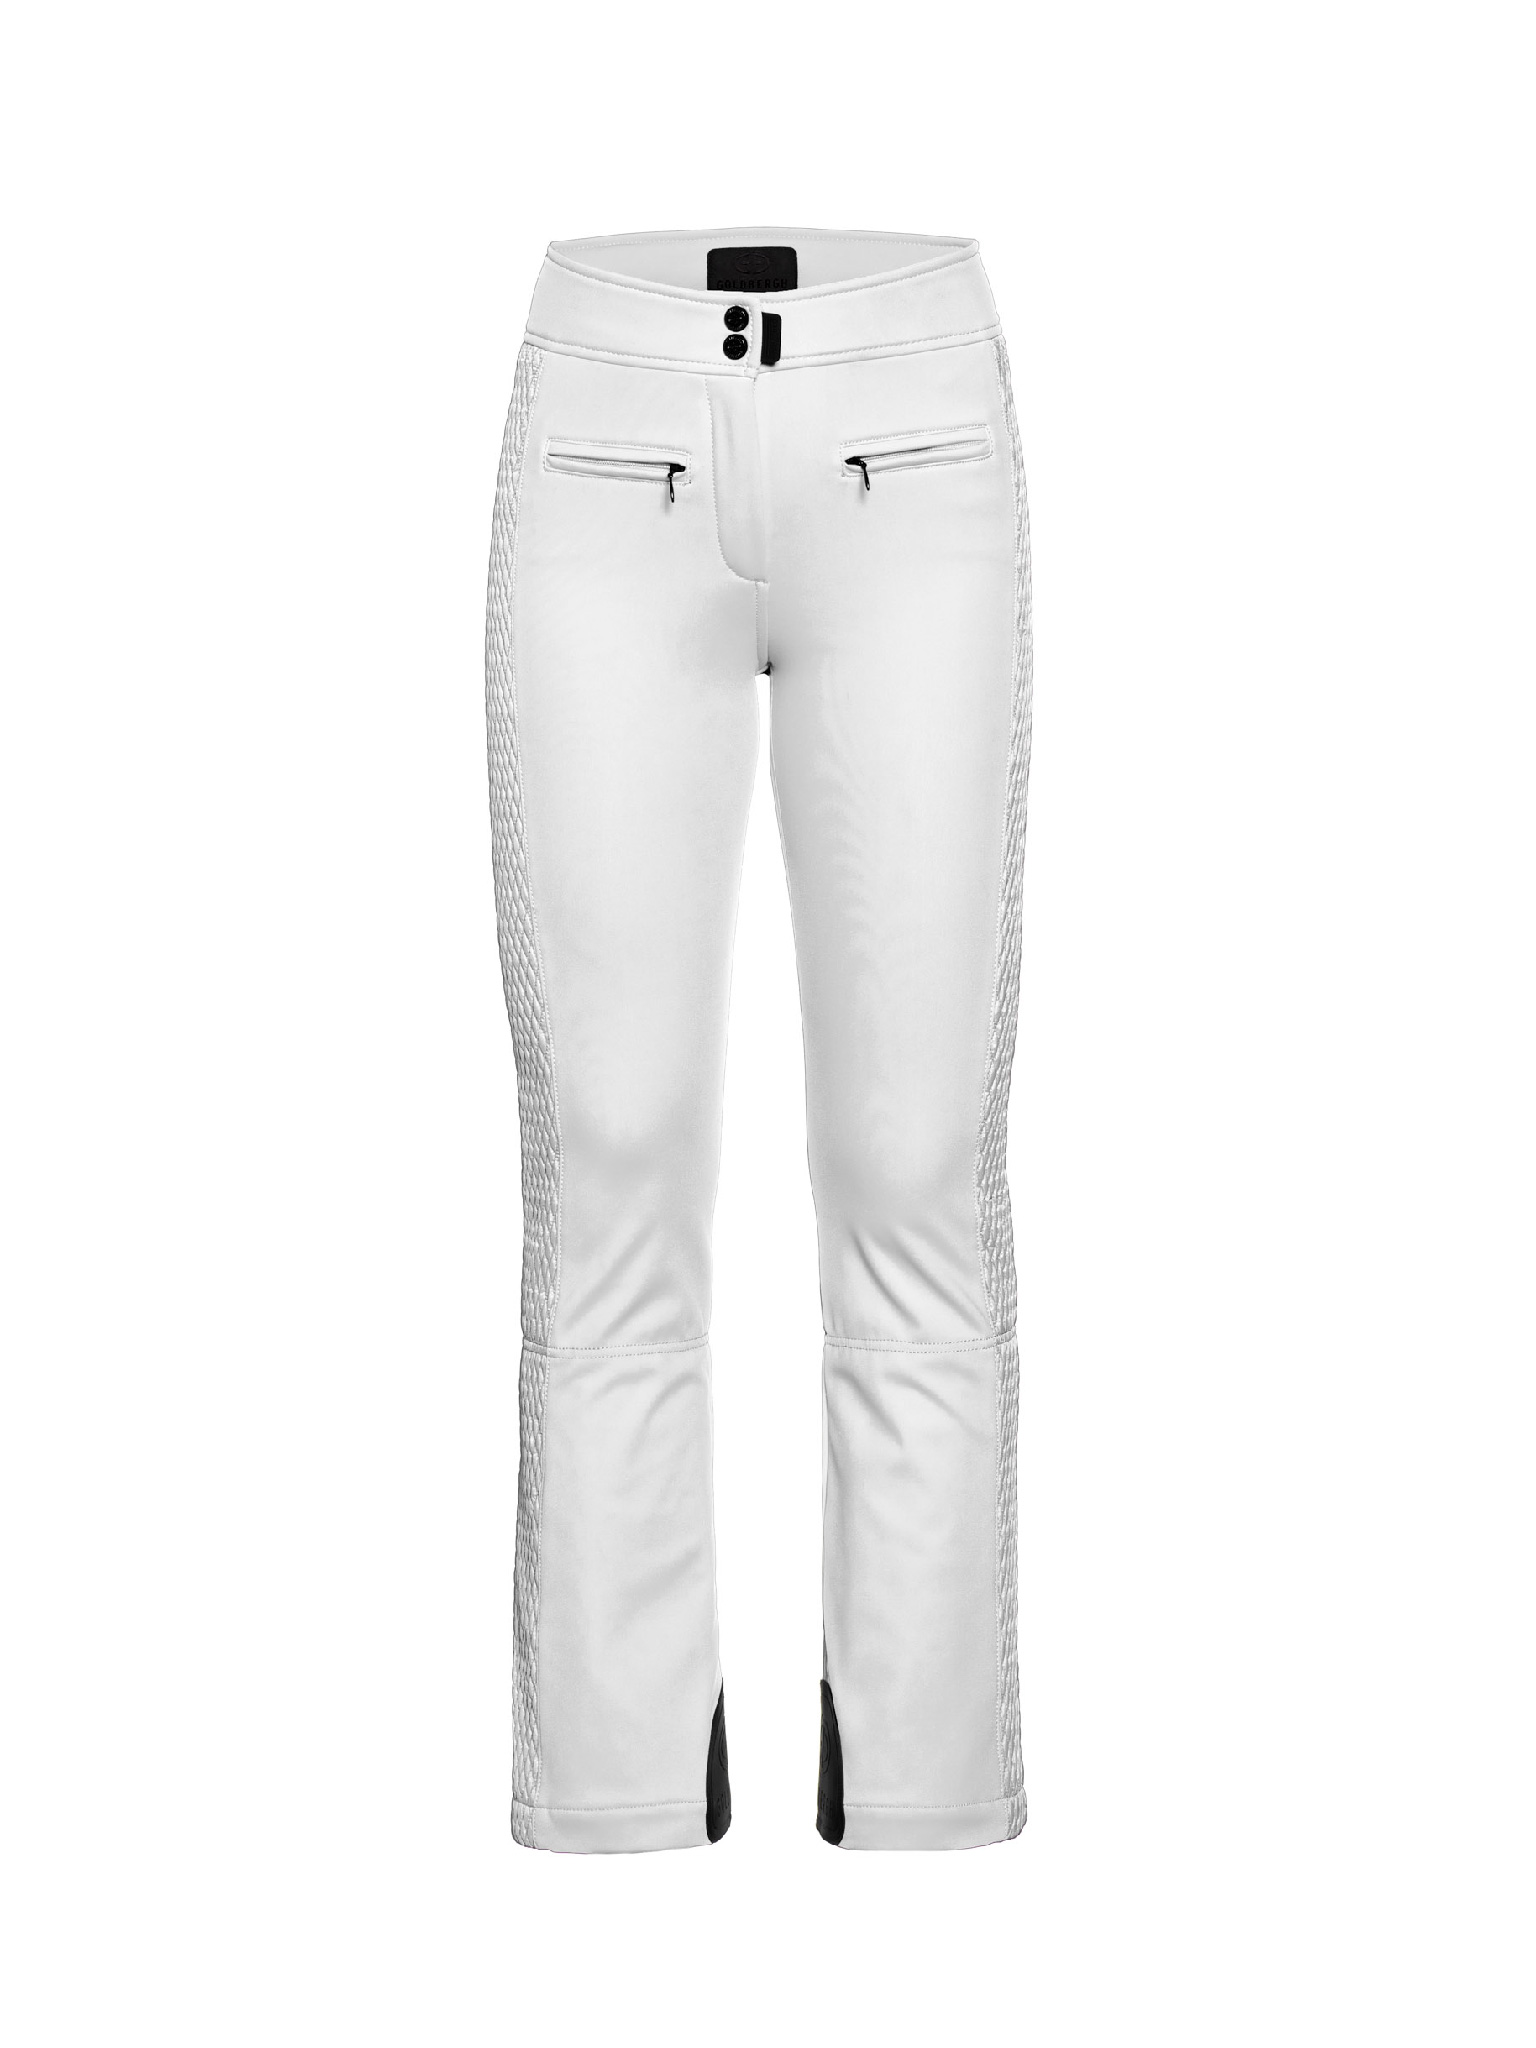 Goldbergh Brooke Ski Pants 2022